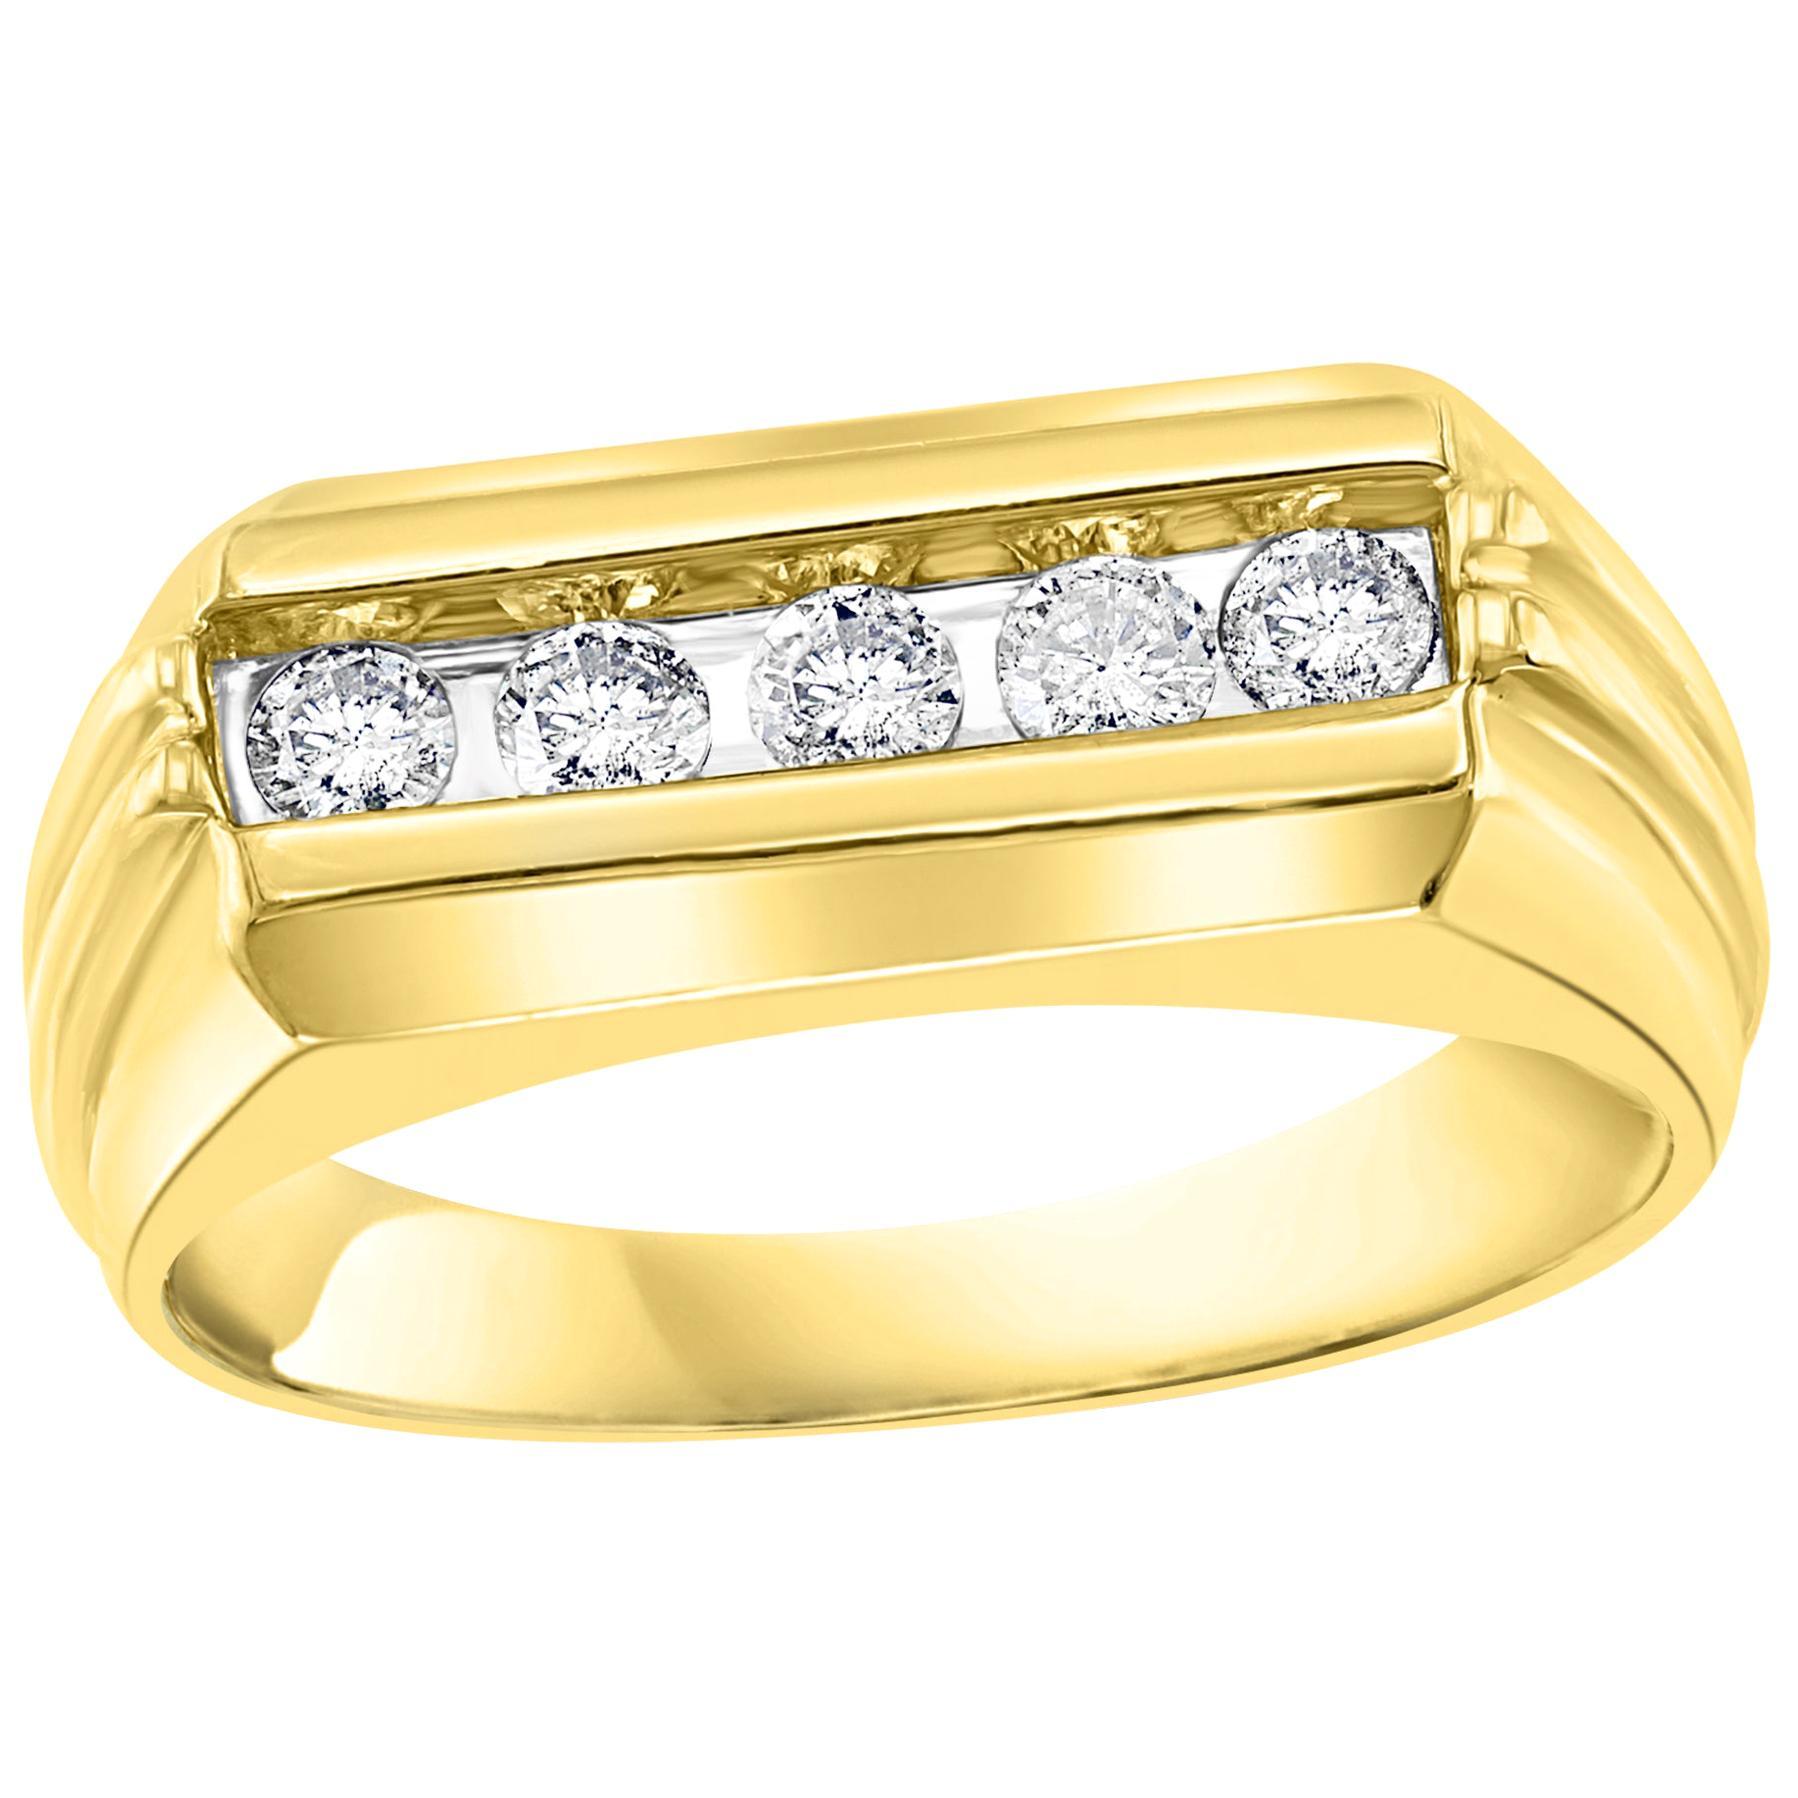 5 Diamonds, Unisex 1-Row Diamond Band Ring in 10 Karat Yellow Gold